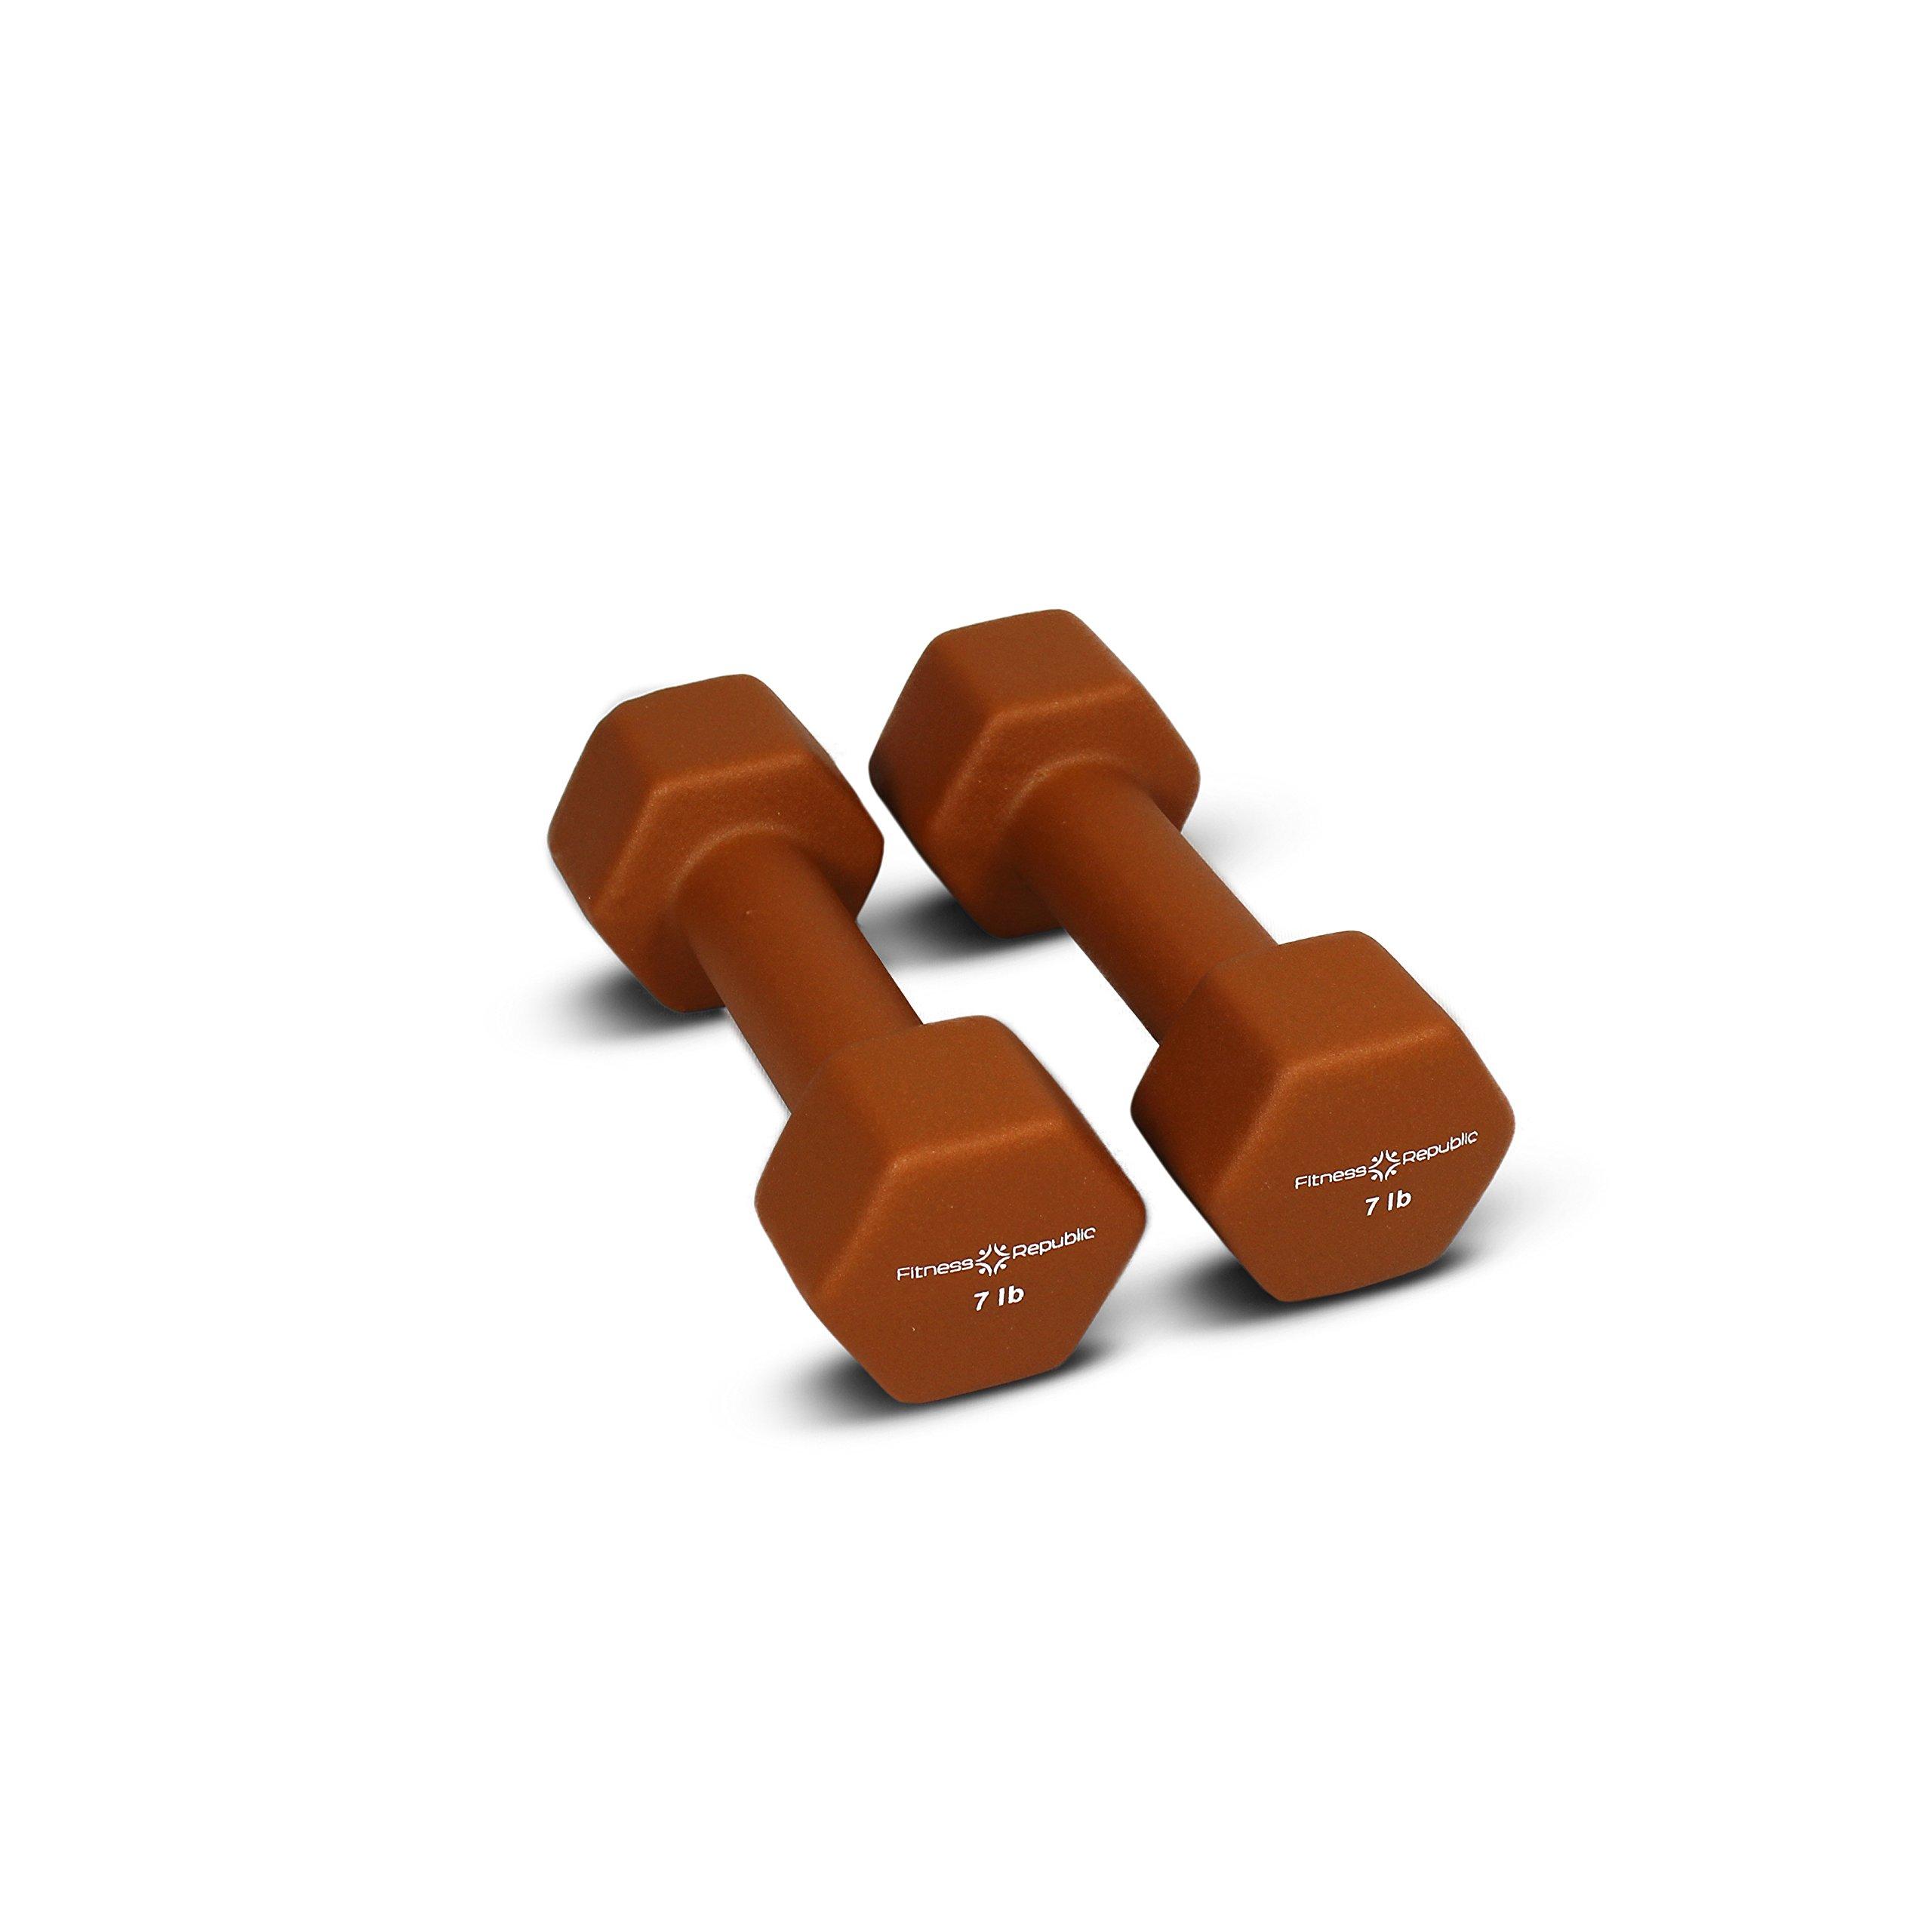 Fitness Republic Neoprene Dumbbells 7 lbs Set (Neoprene Weights)